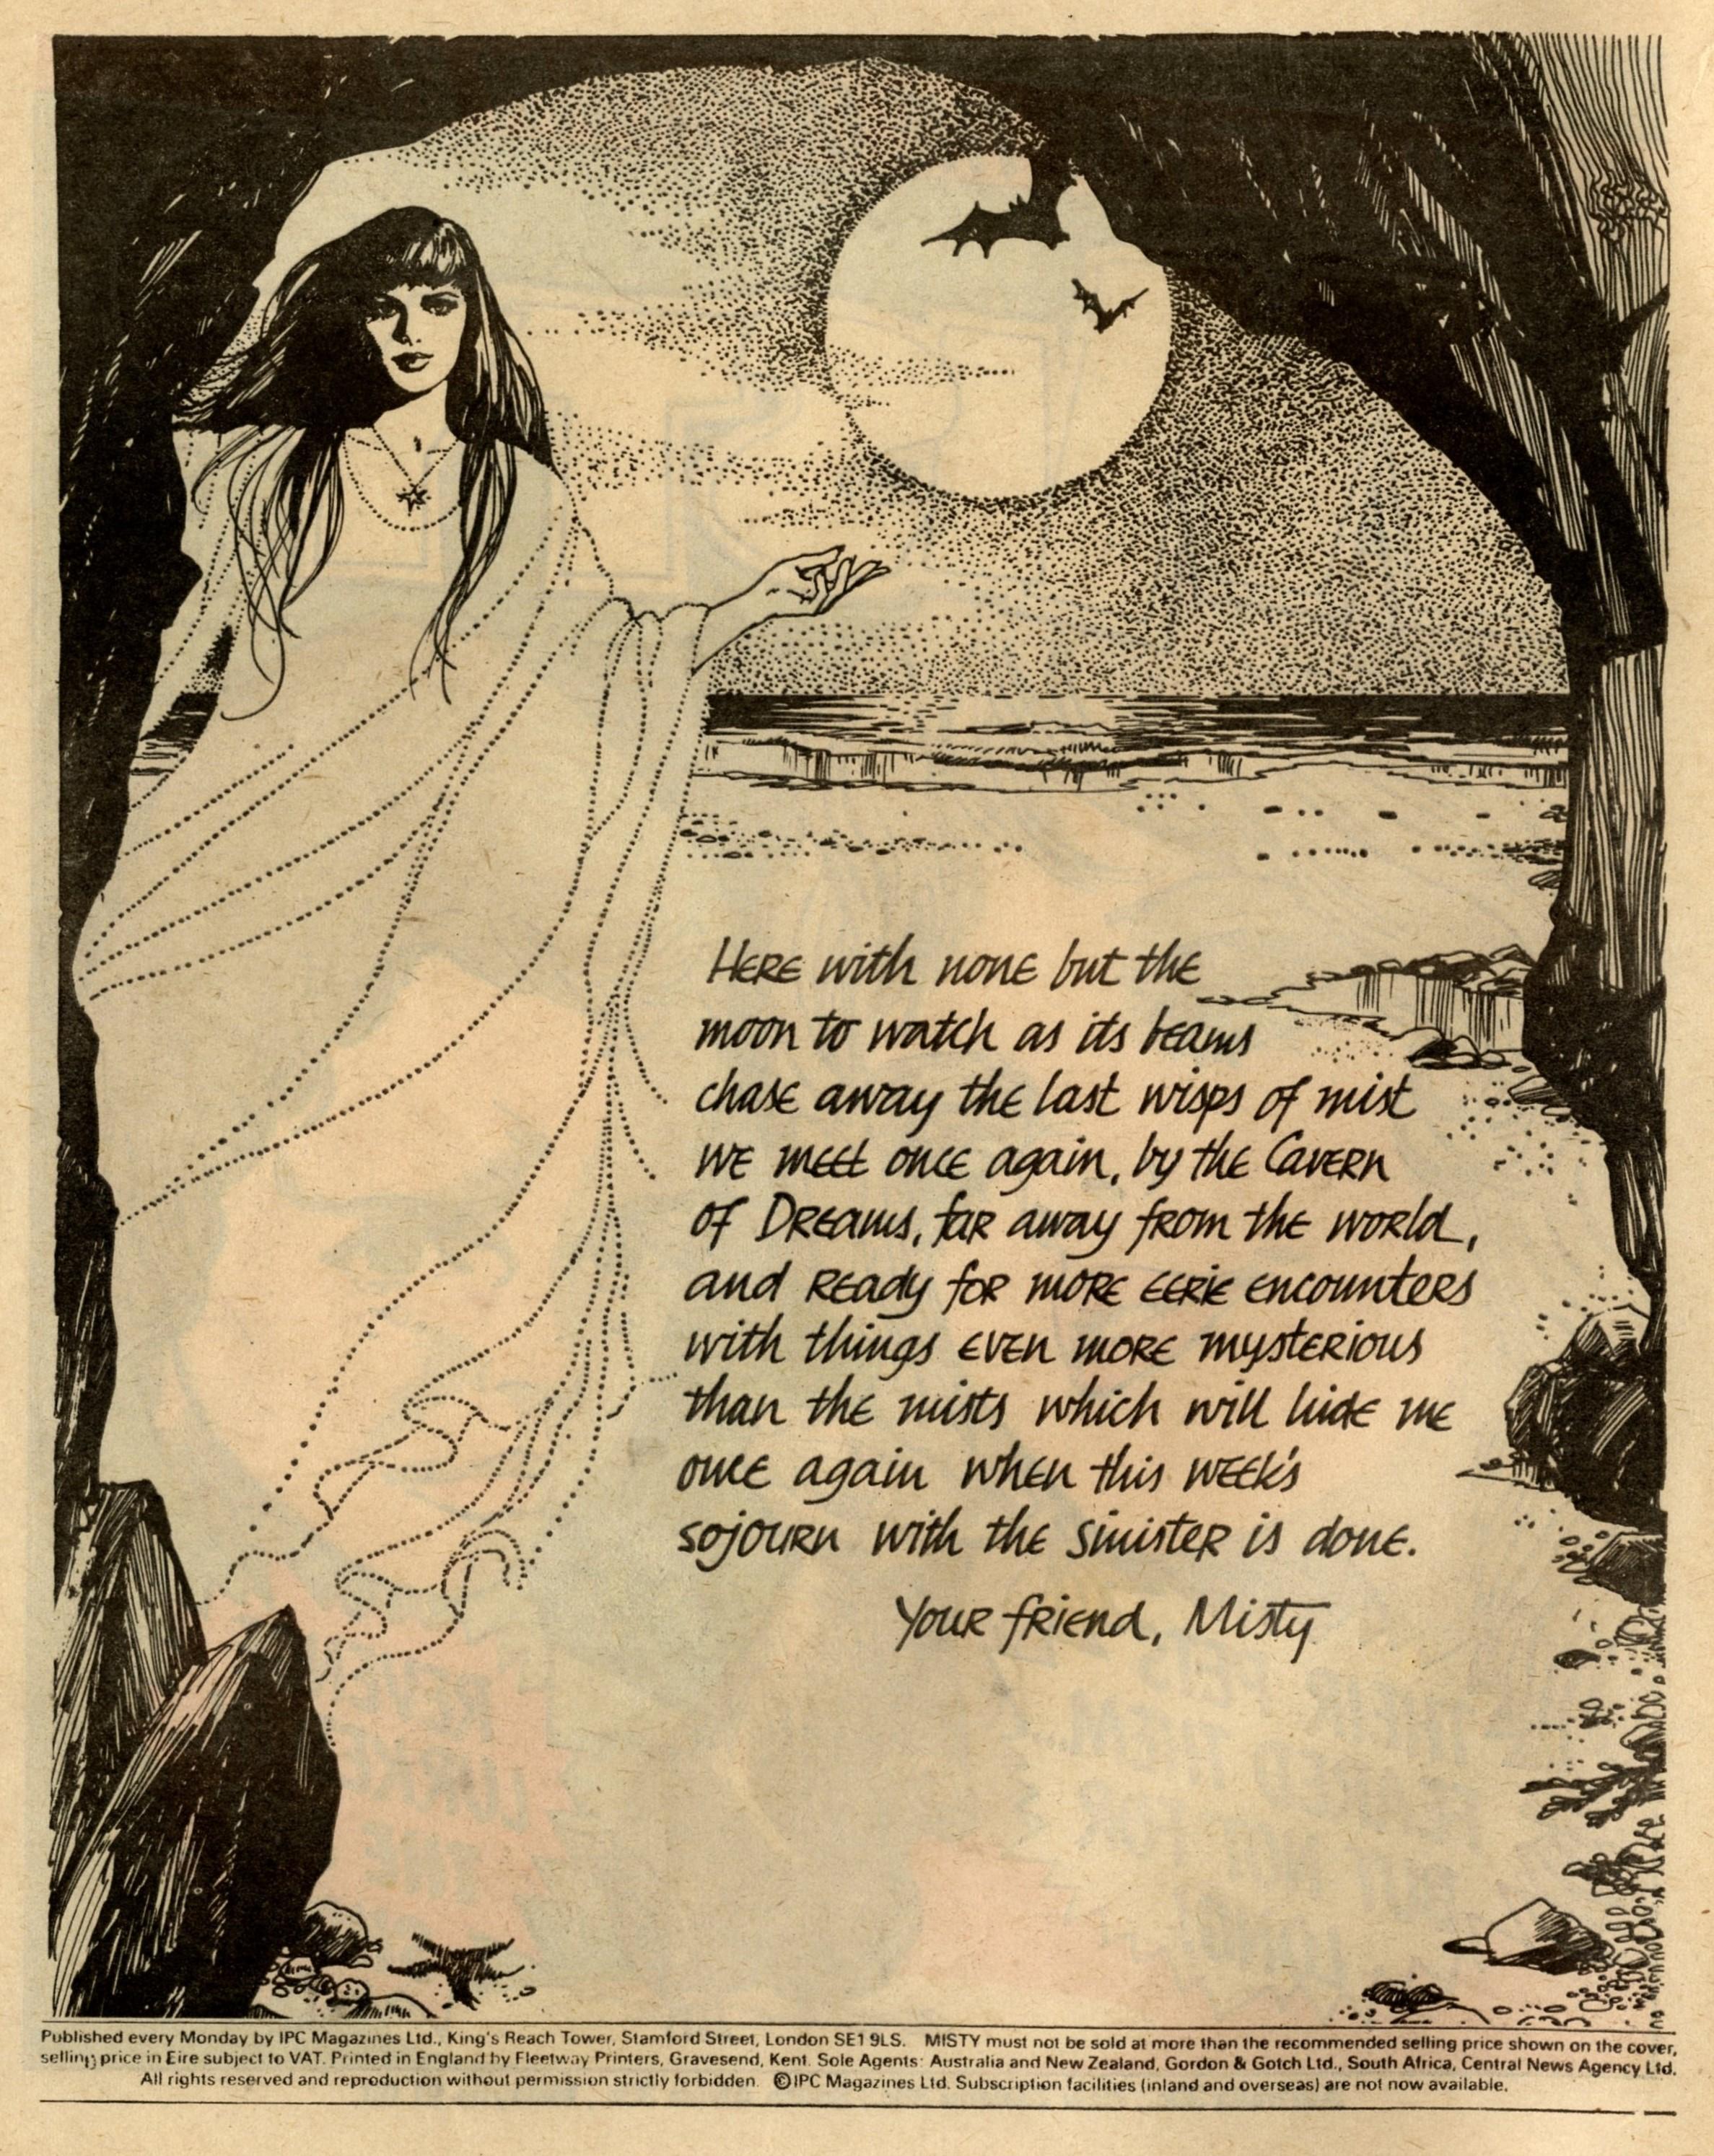 Misty introduction: Shirley Bellwood (artist)